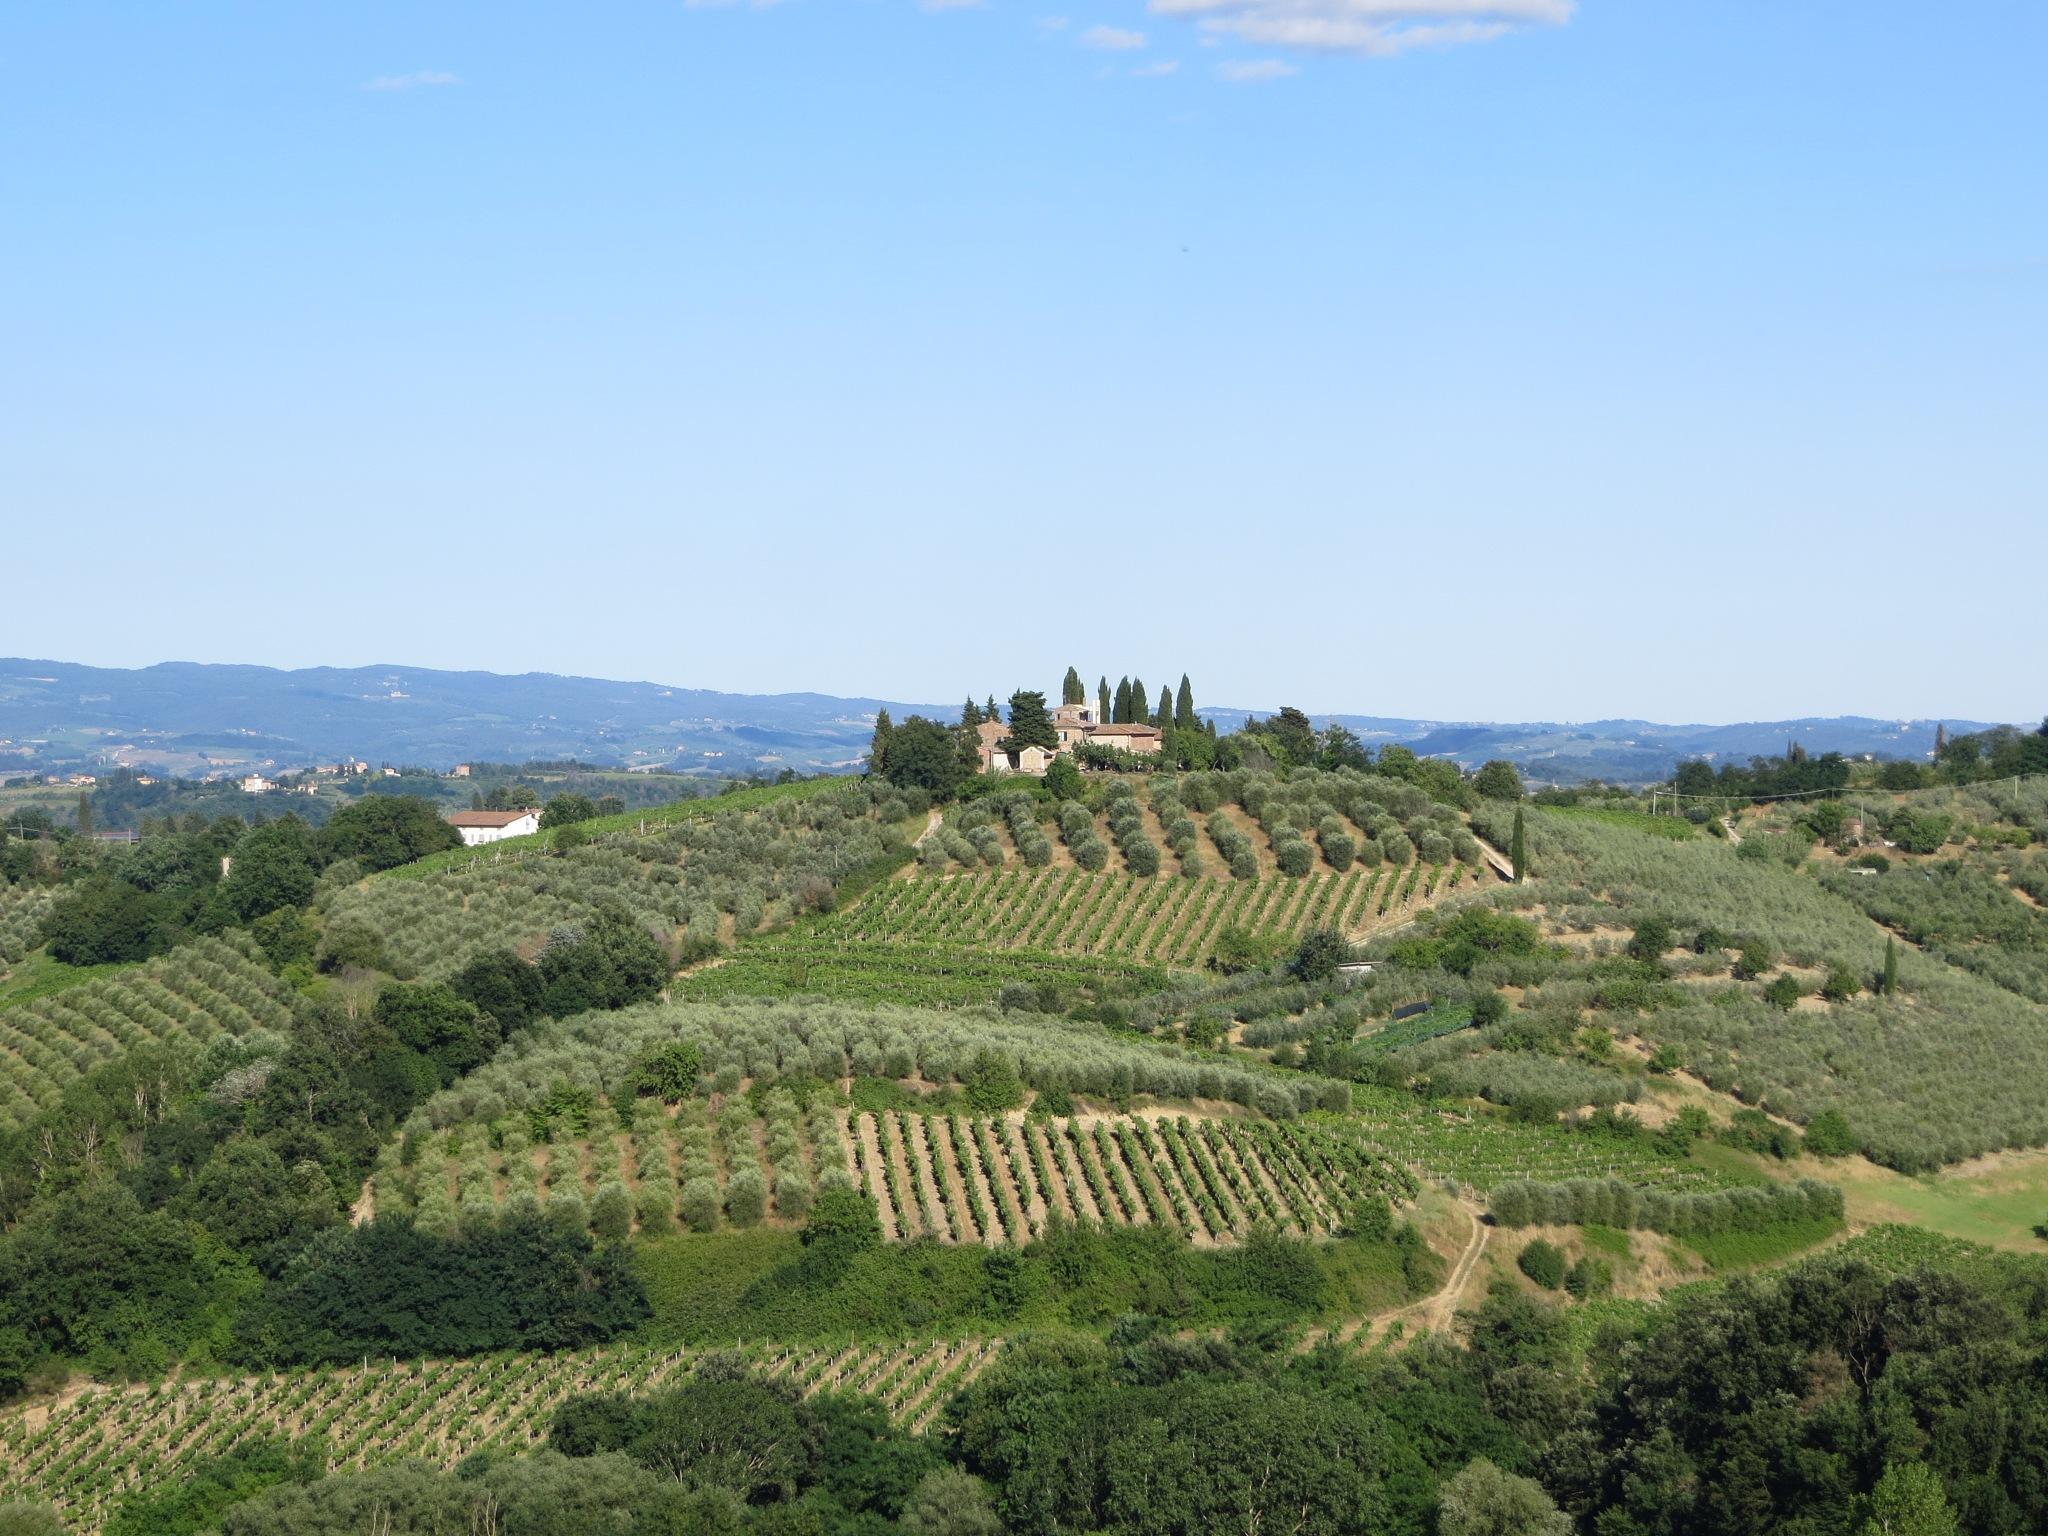 Tuscany (Toscana) by kamelk